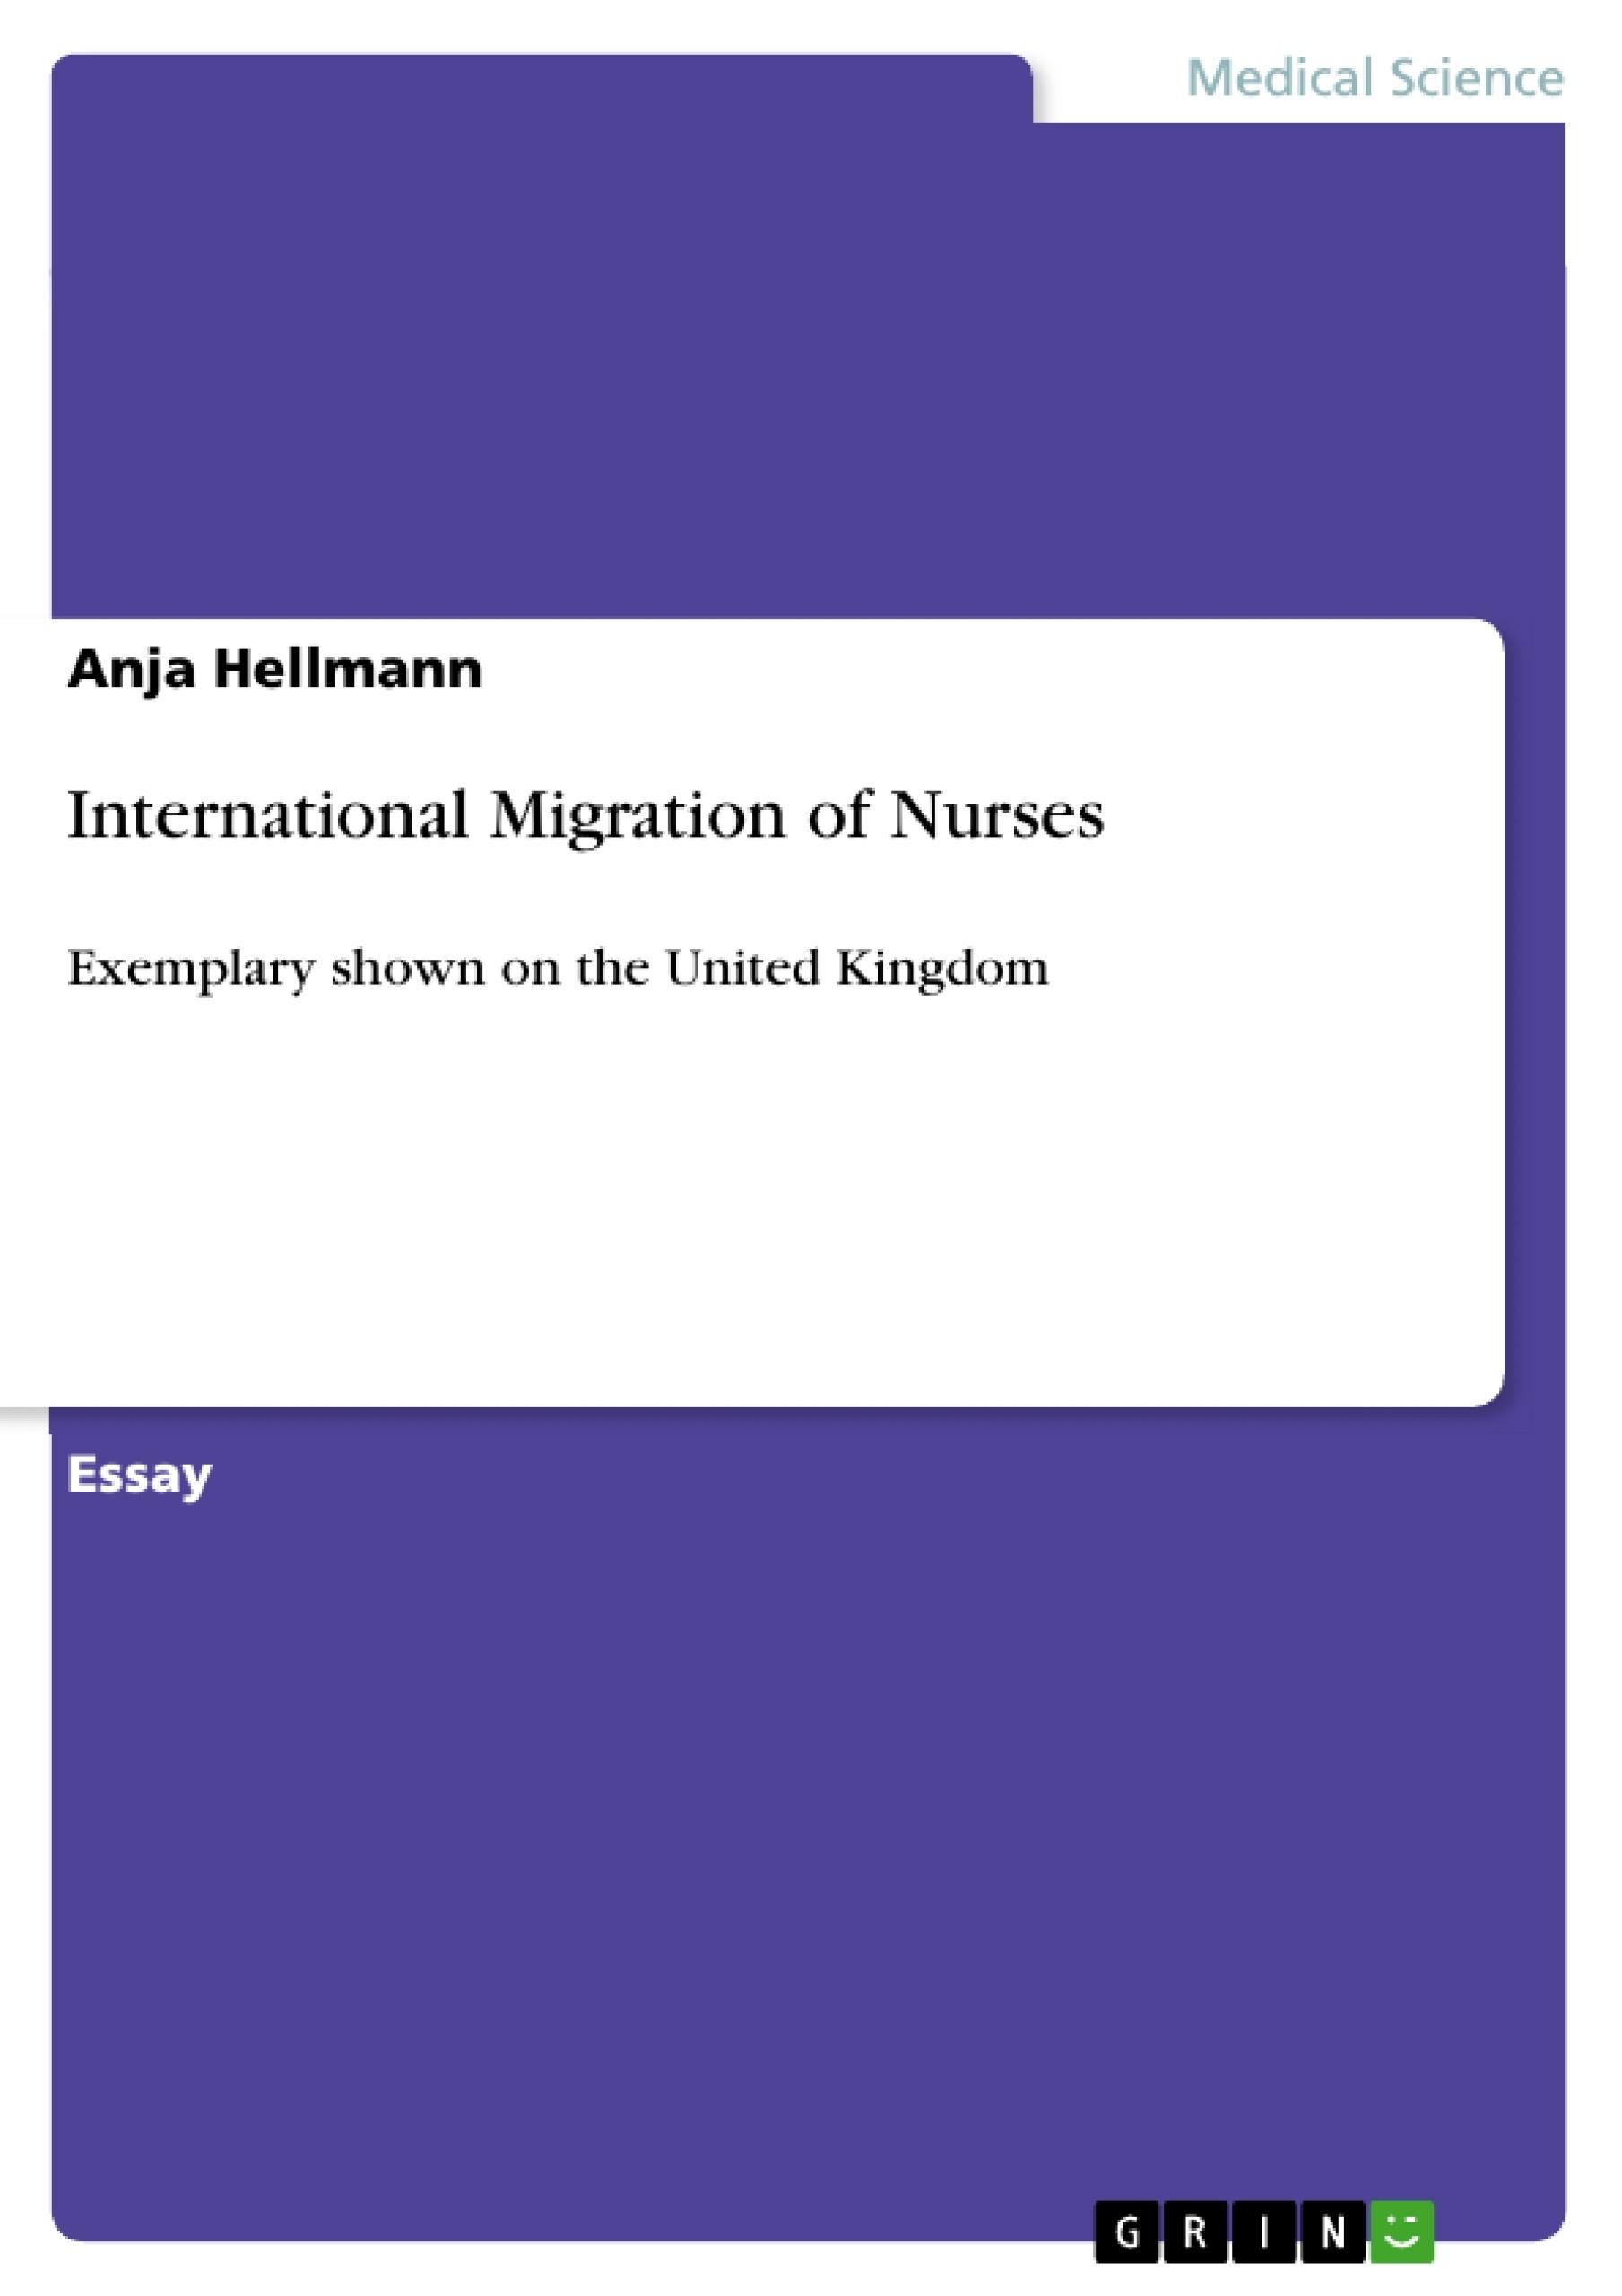 Title: International Migration of Nurses